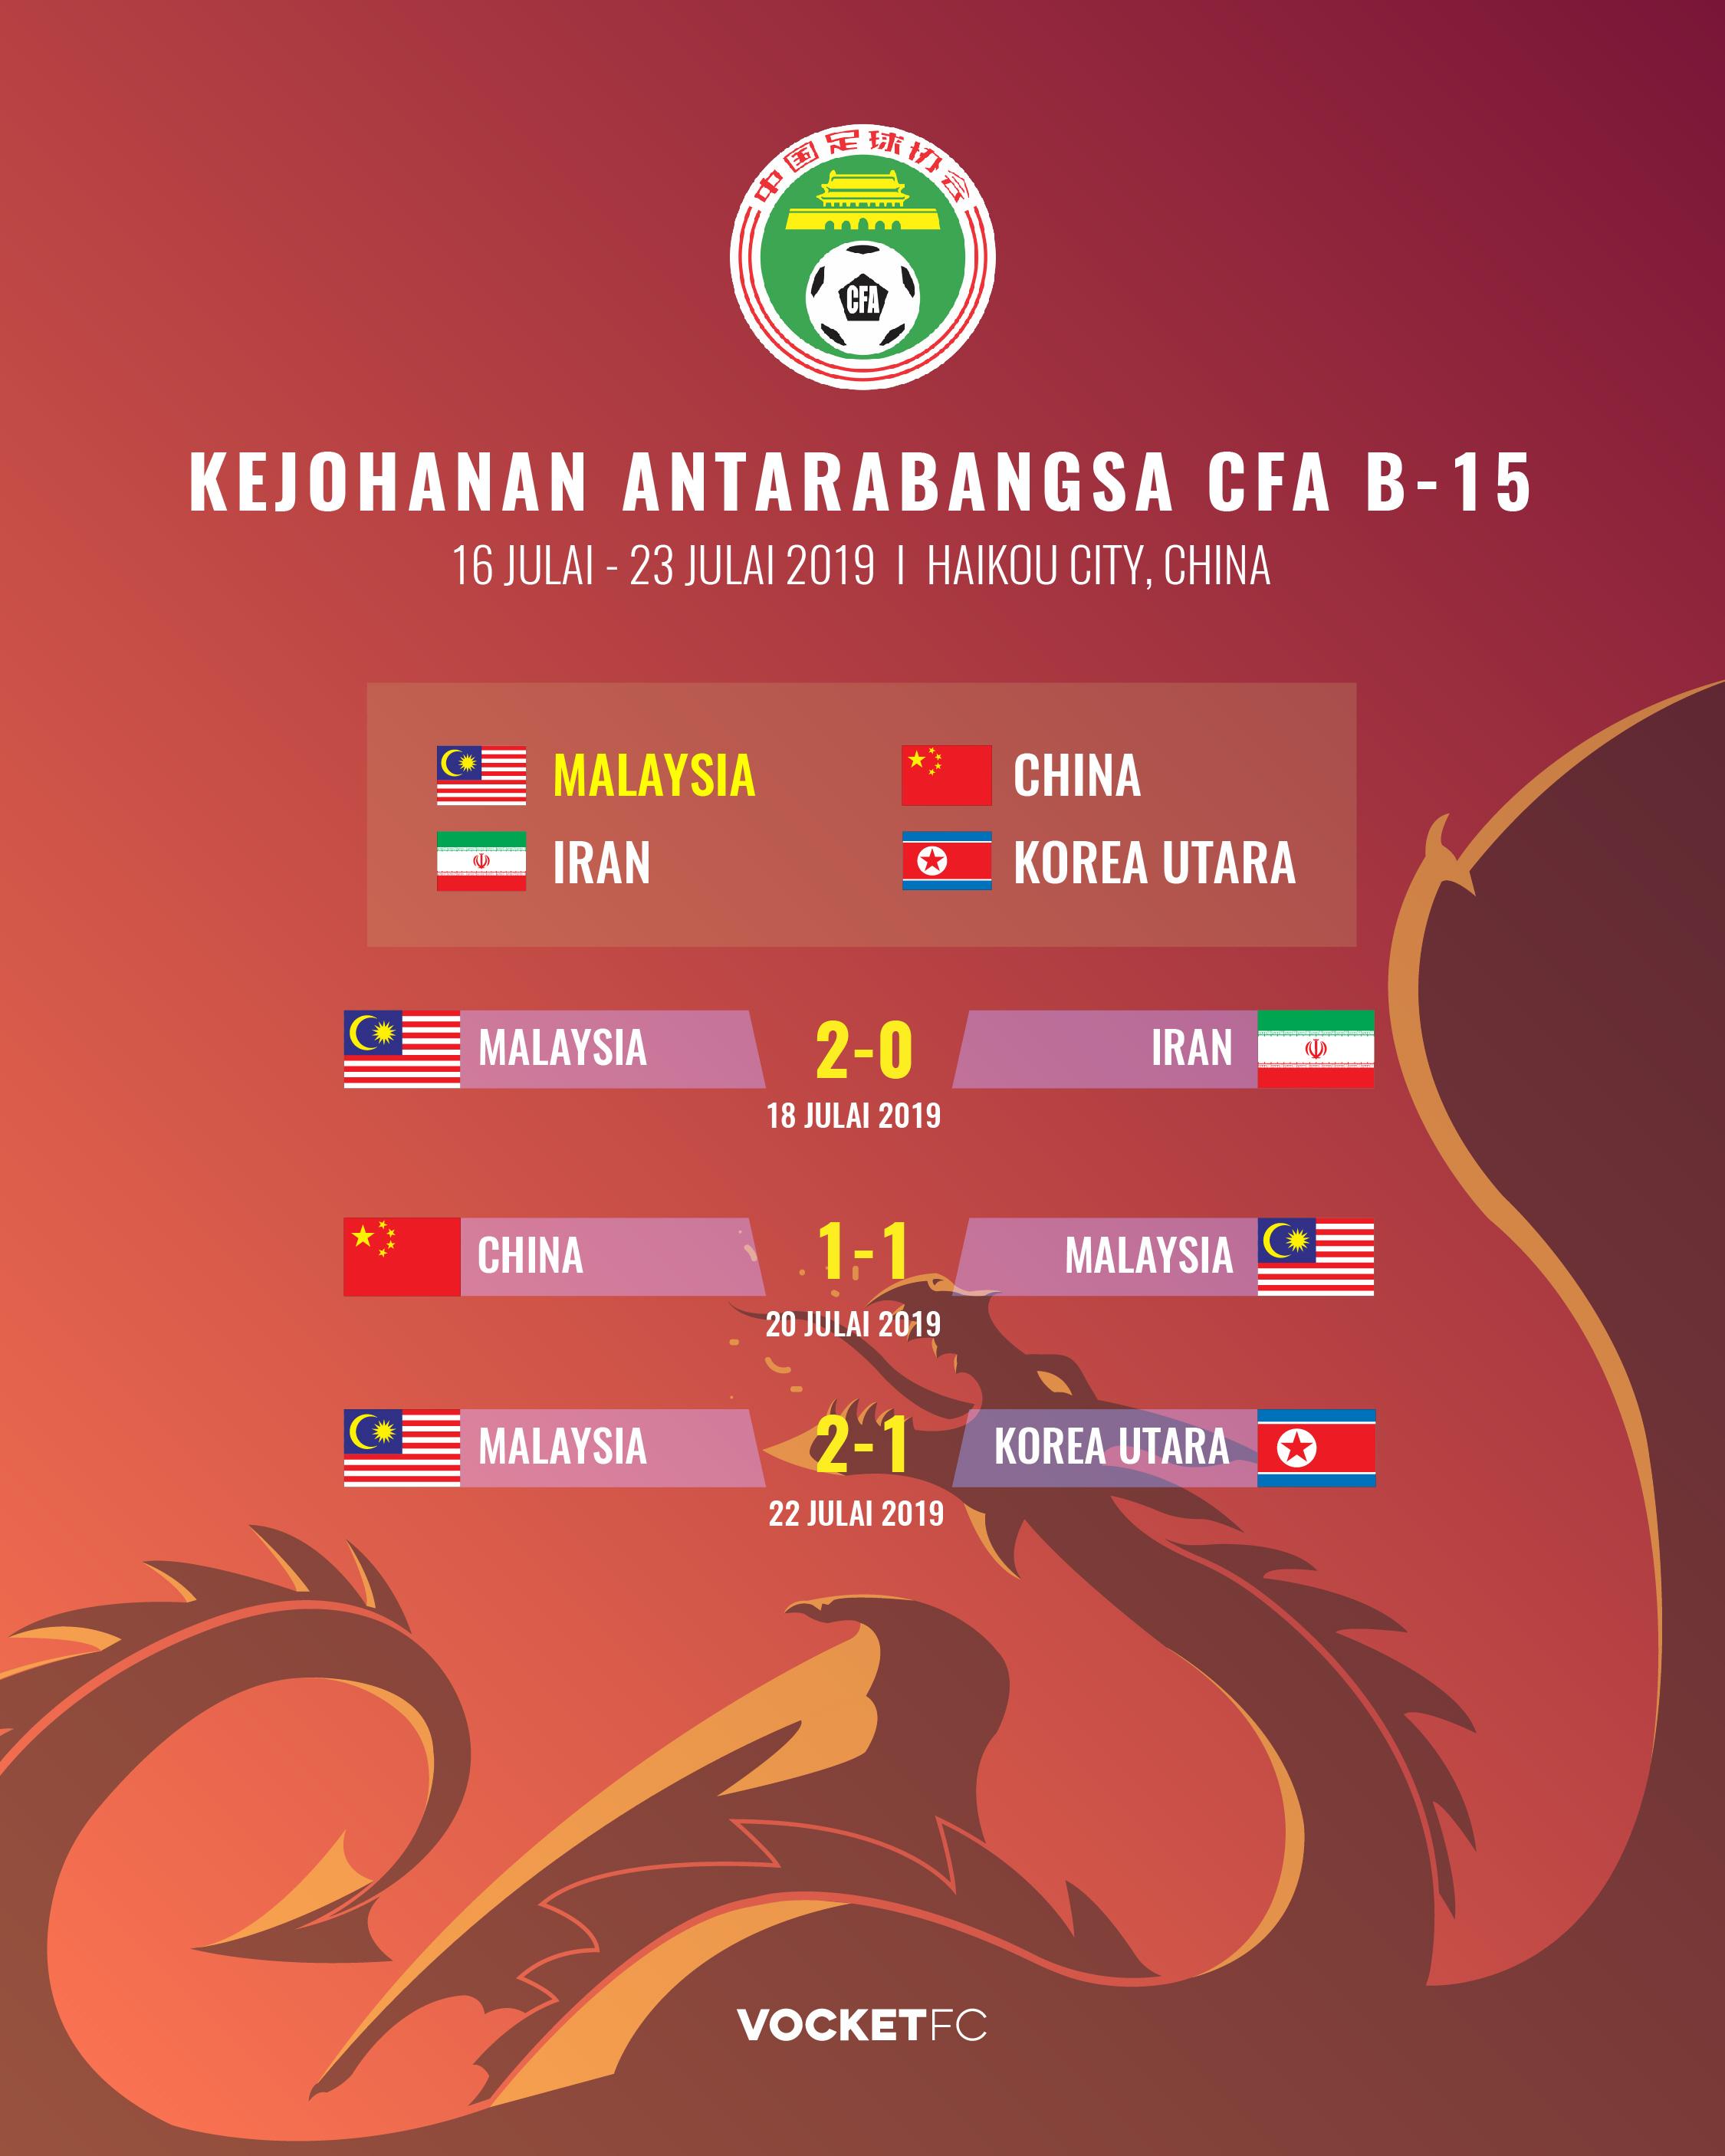 CFA U15 vocket-01-01